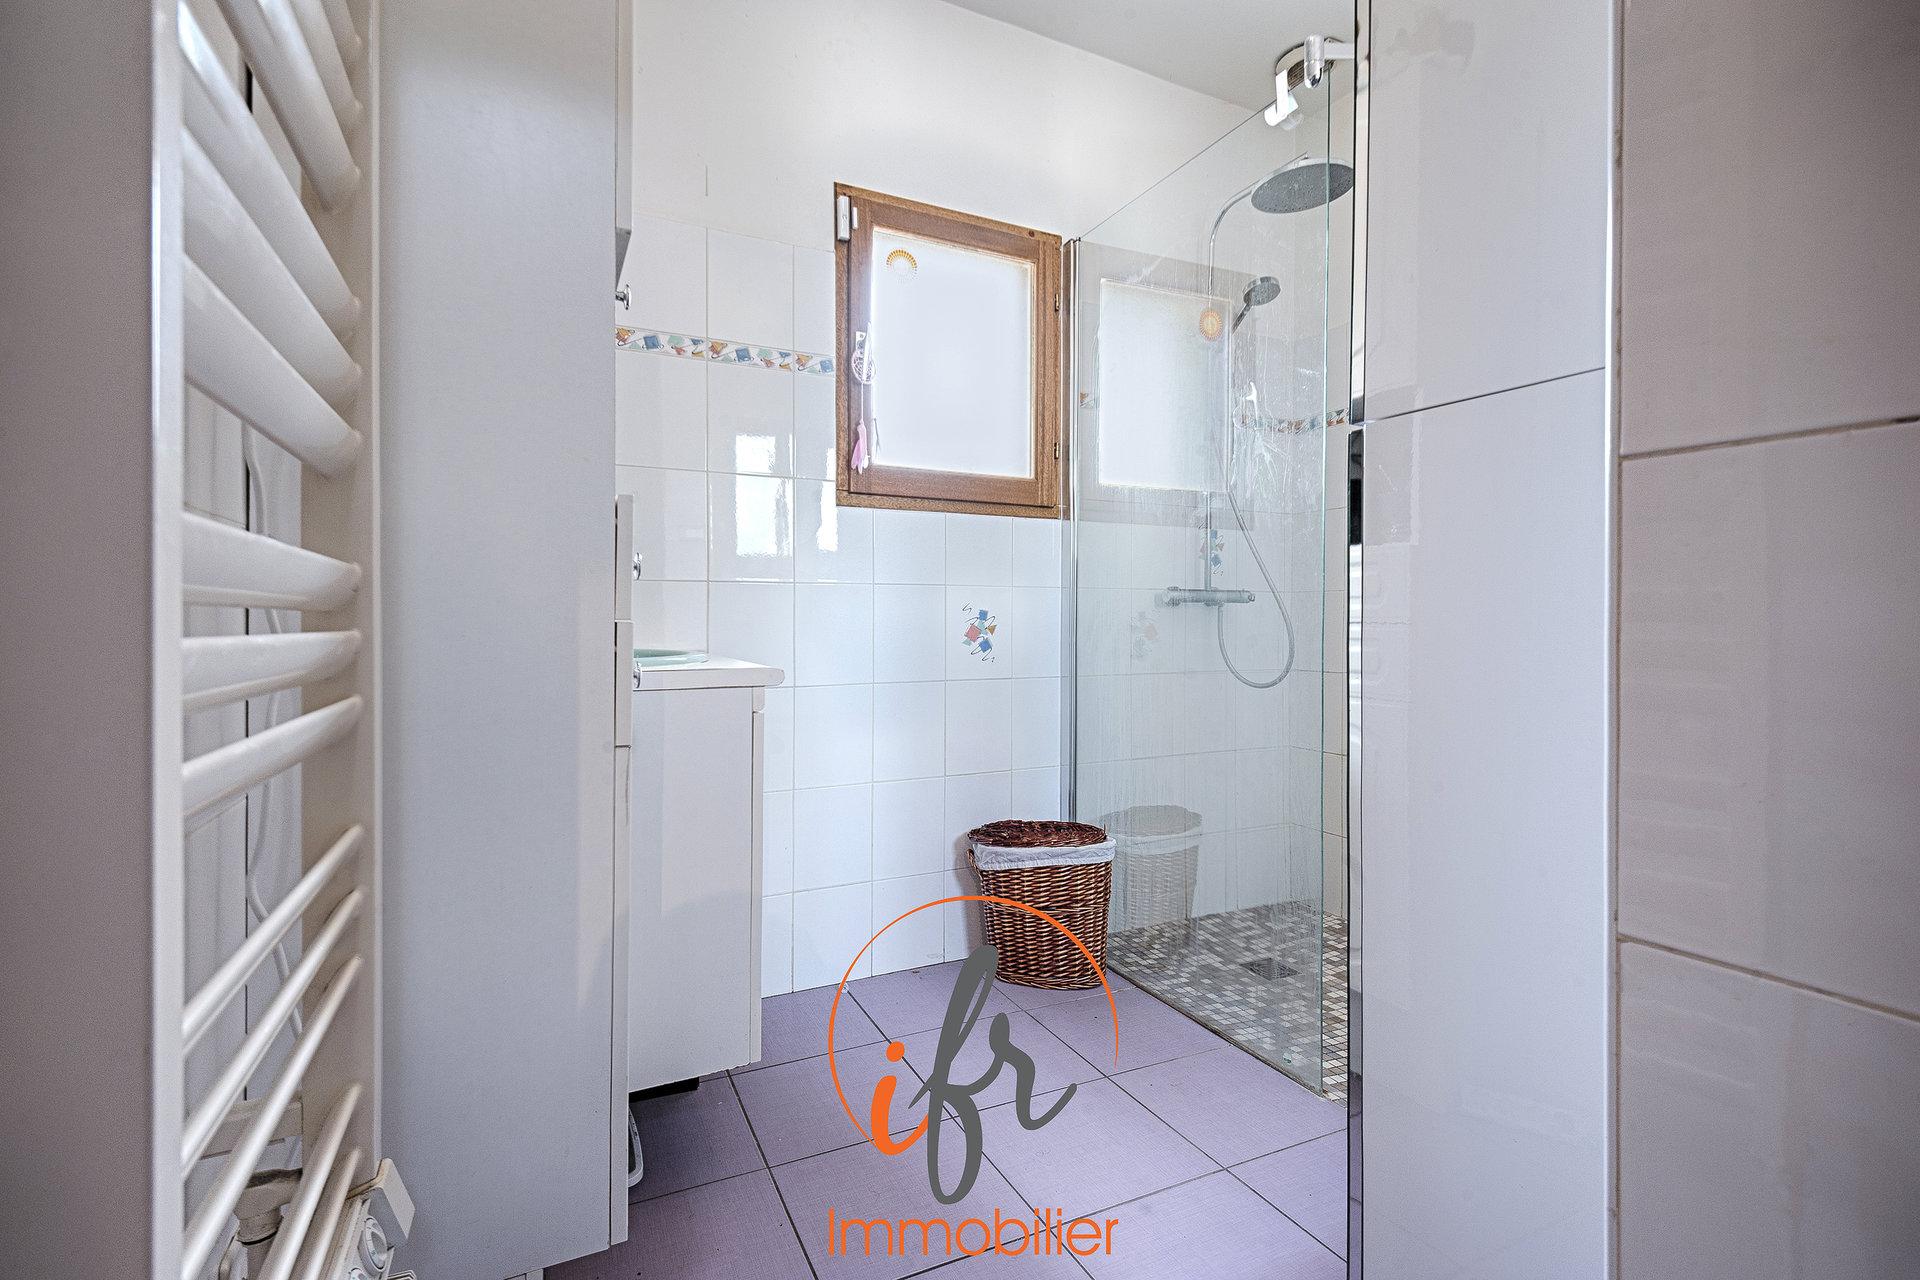 15' BOURGOIN-JALLIEU / Maison dauphinoise - 5 chambres